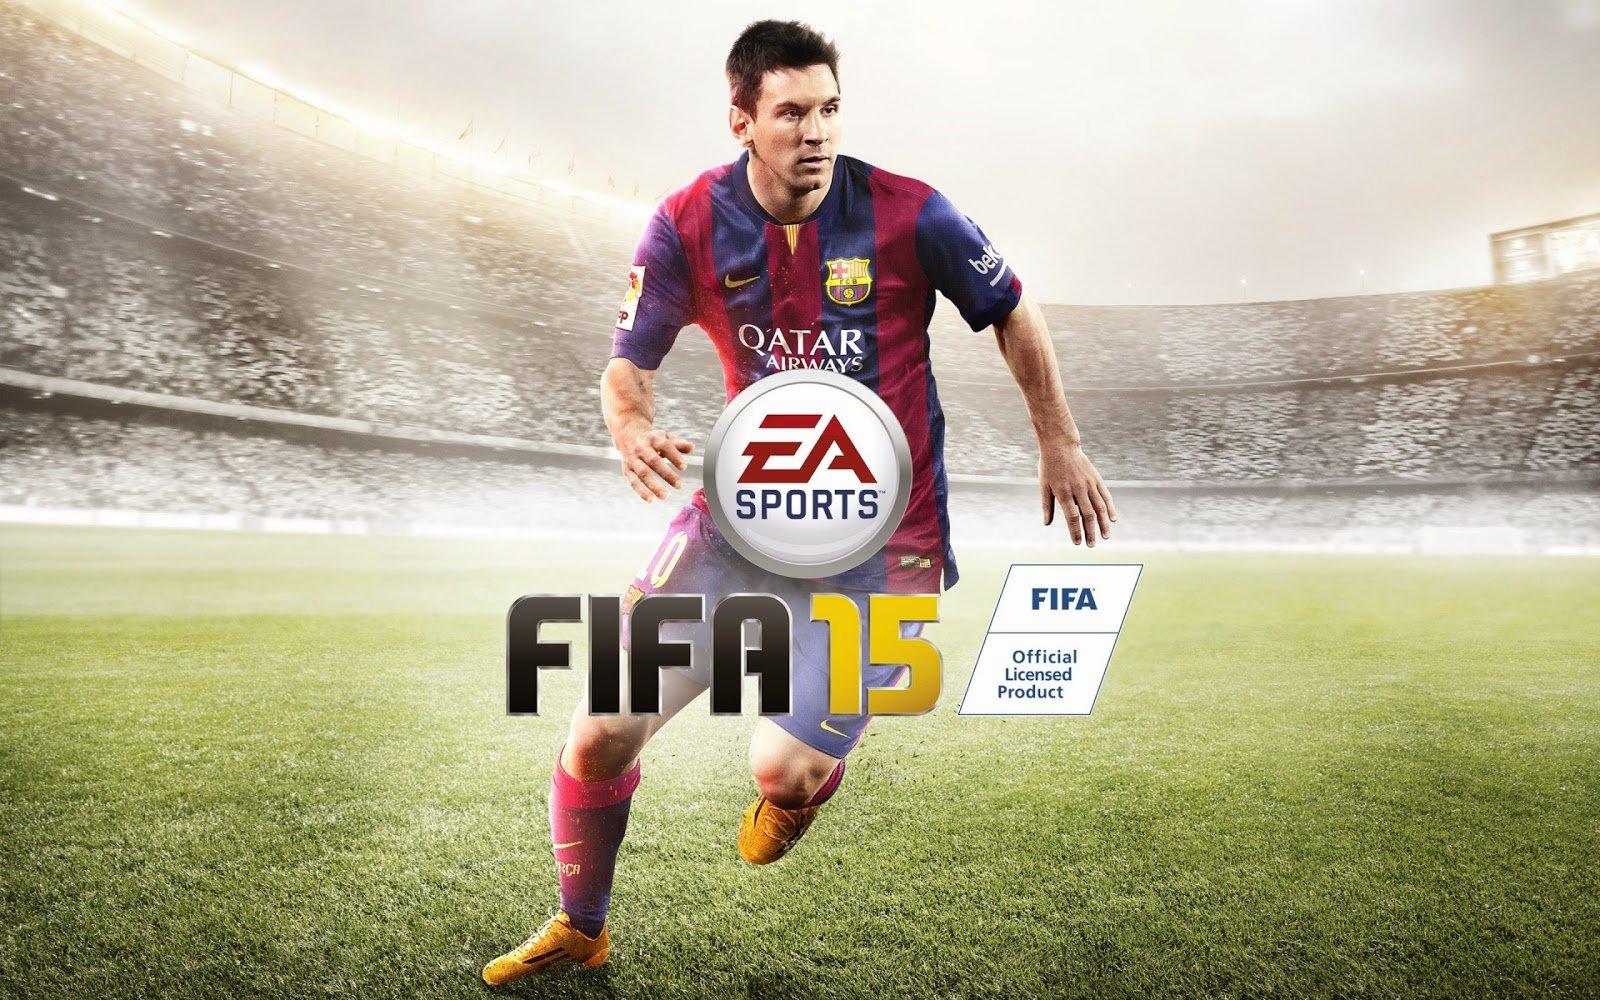 fifa-2015-game-hd-wallpaper